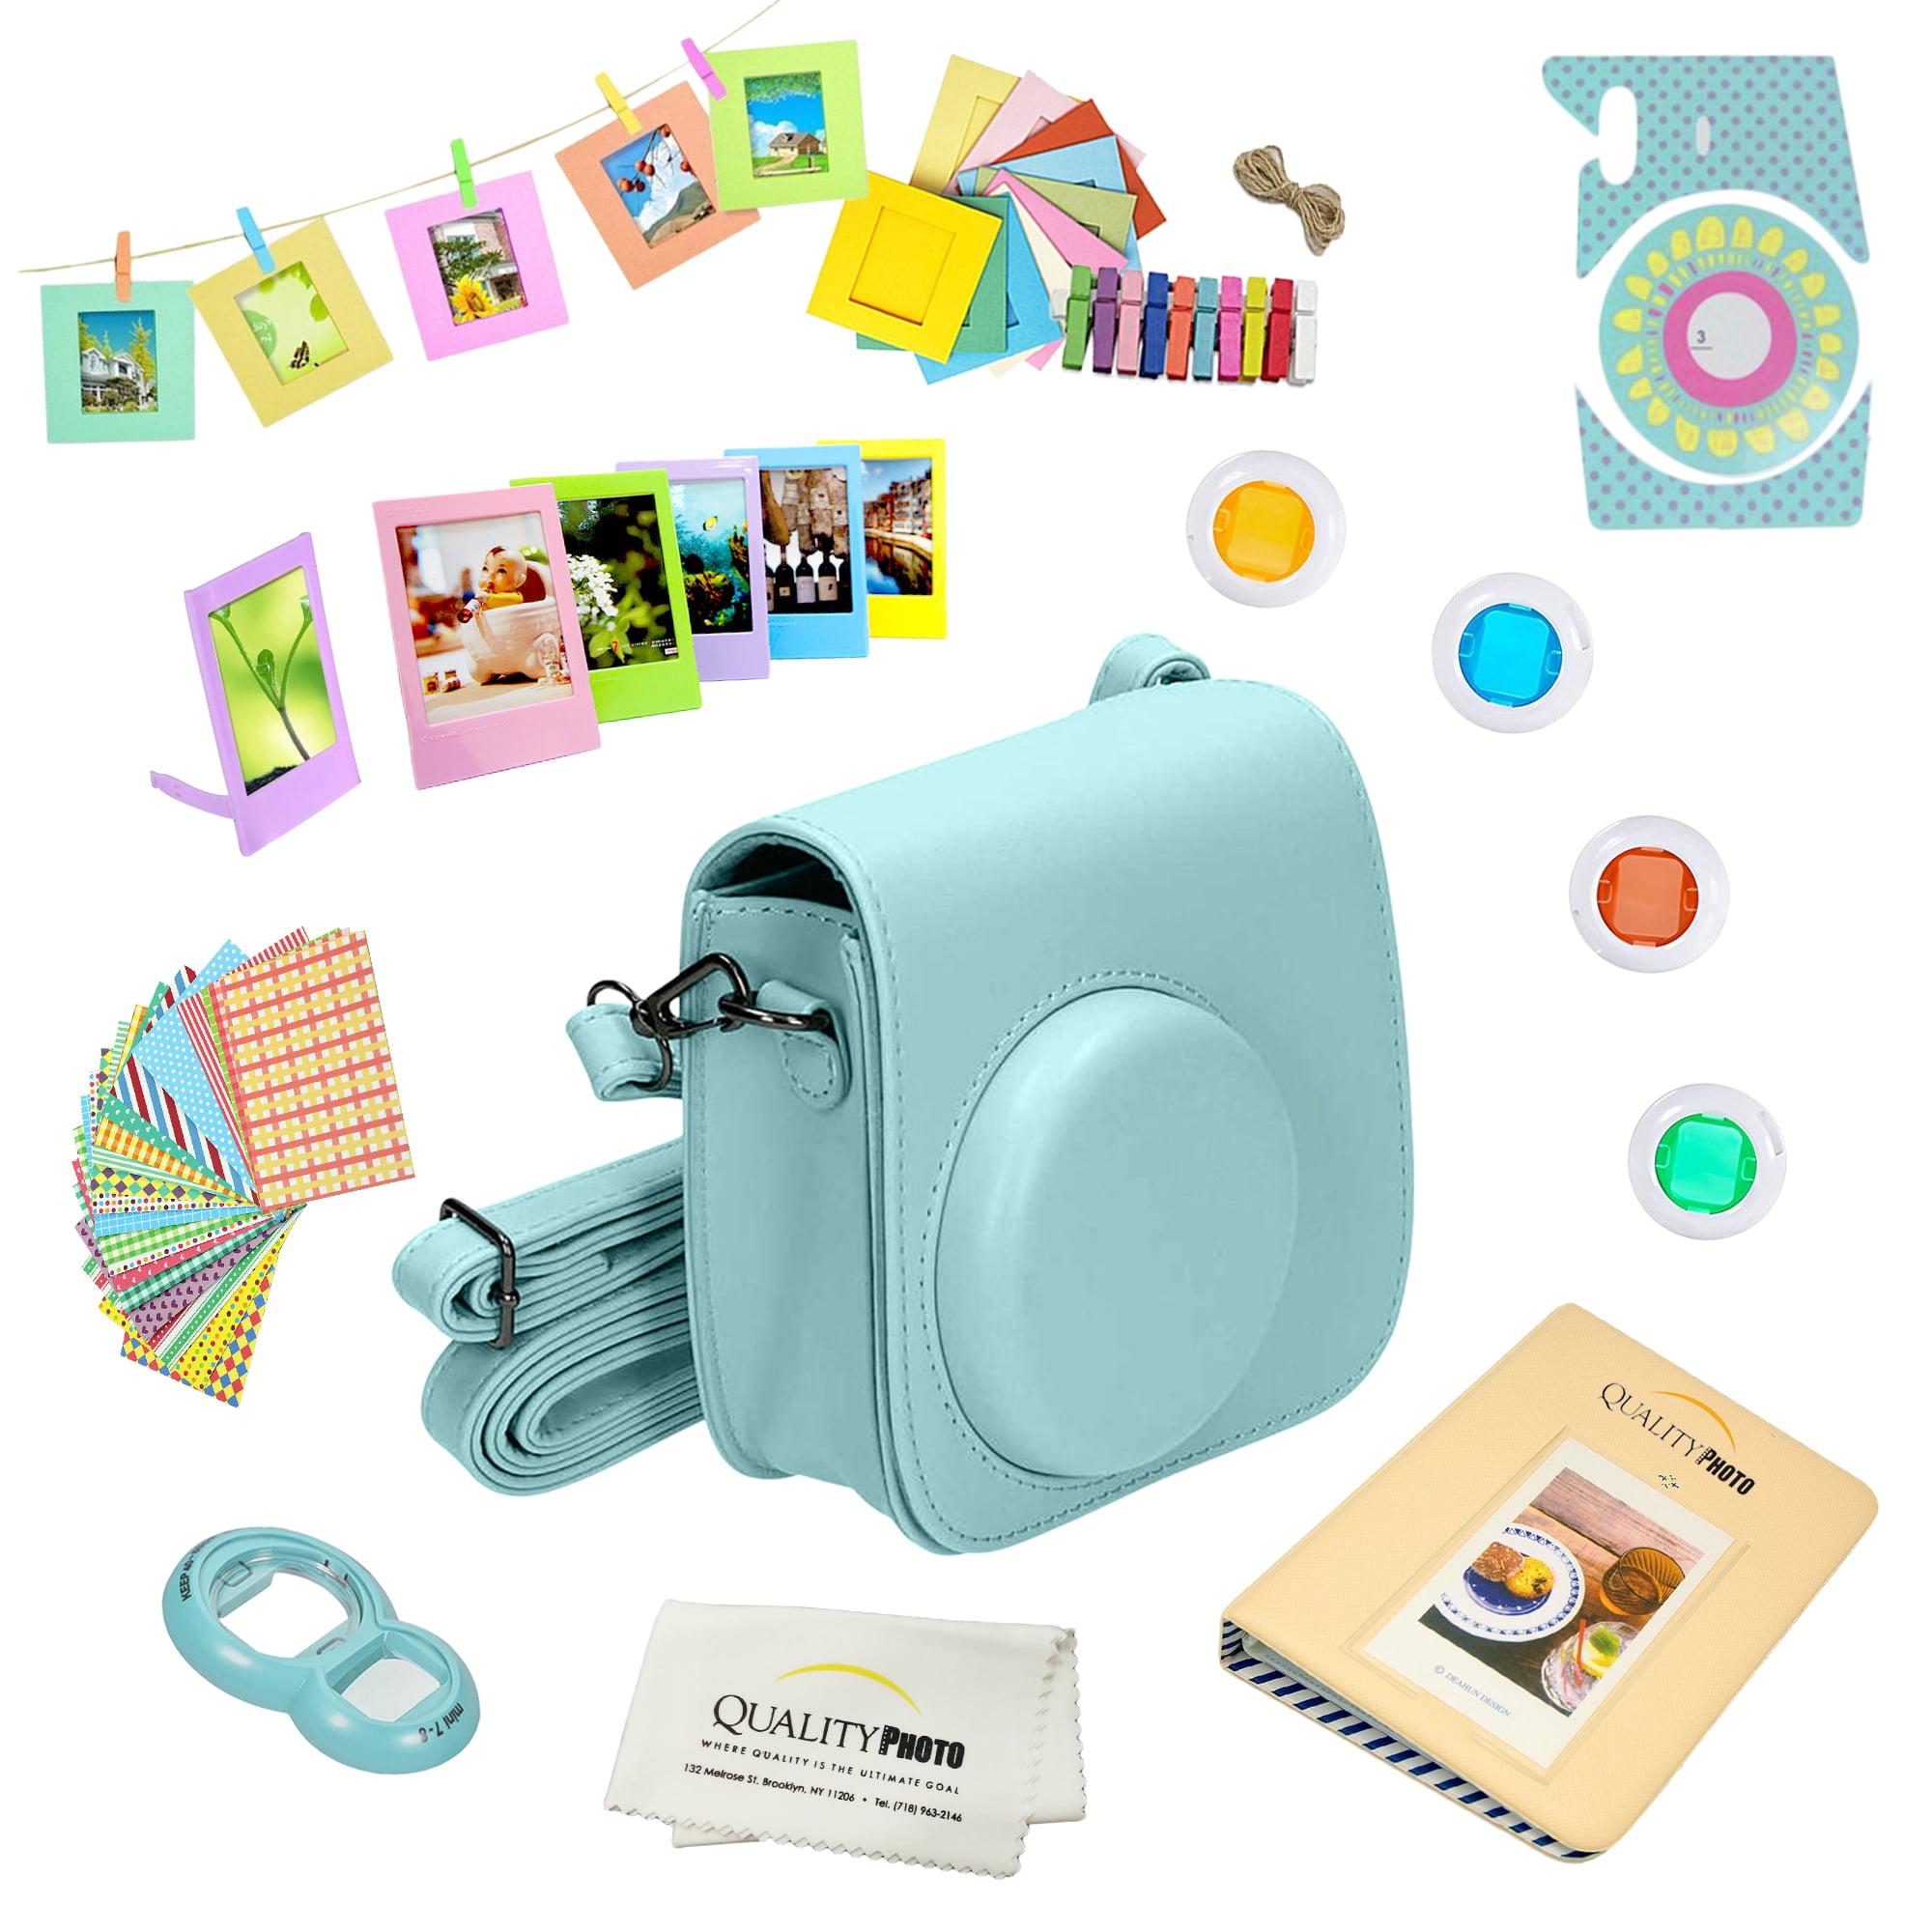 2418baf6 0640 4c74 9edd a73e761b8448 1.ebec71d5d3e13cd8f1129bca5b7e11a6 - Ultimate Fujifilm Instax Mini 9 Guide - How To use The Fuji Instax Mini 9